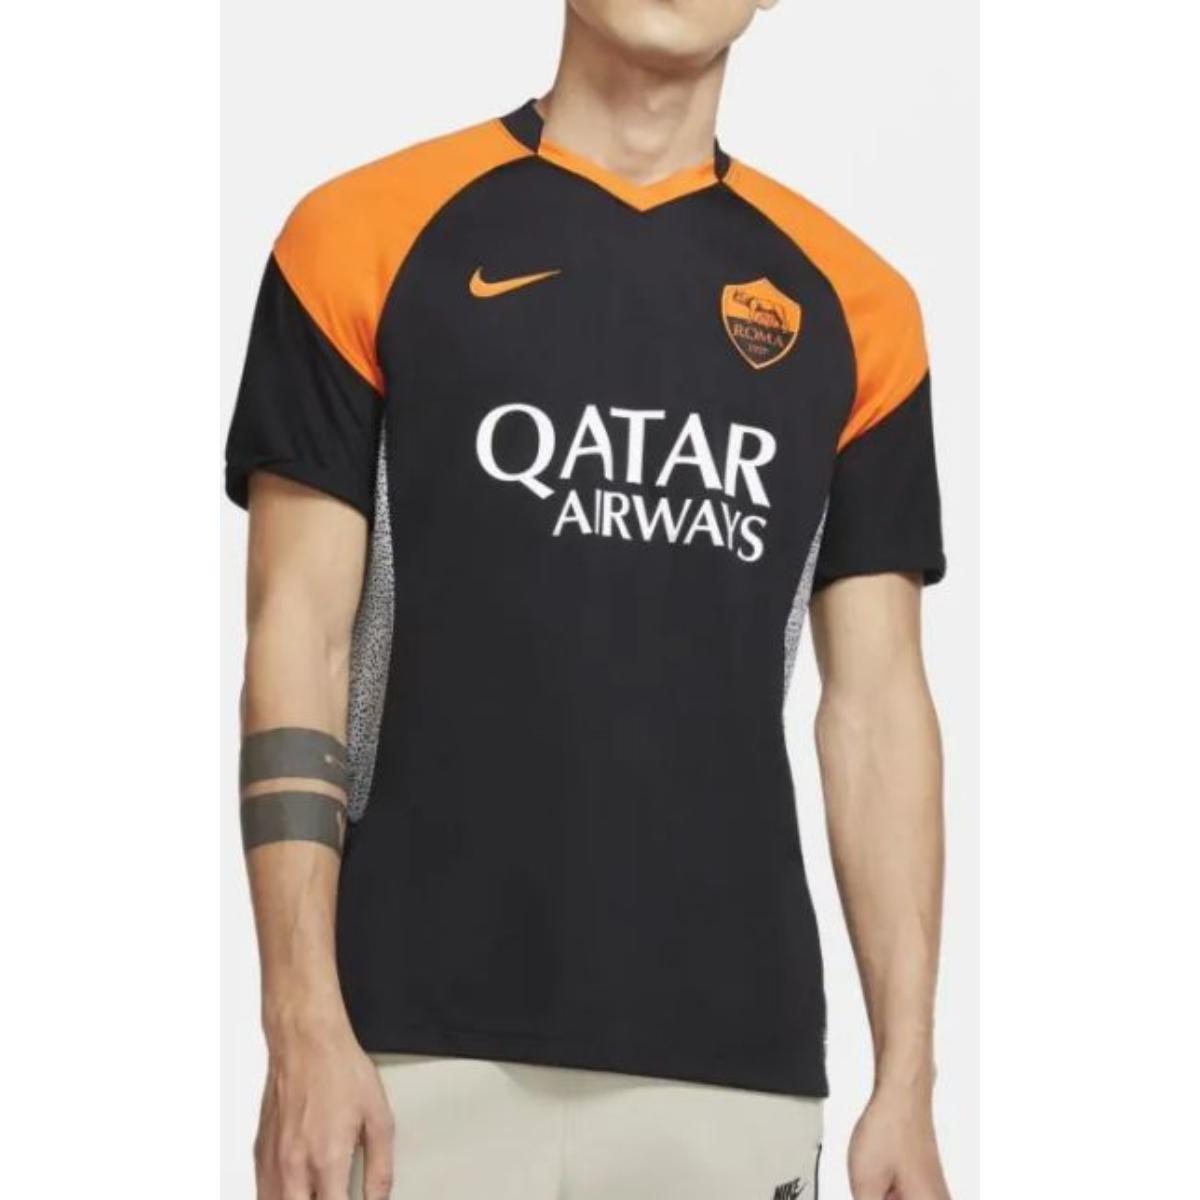 Camiseta Masculina Nike Ck7828-011 Roma Preto/laranja